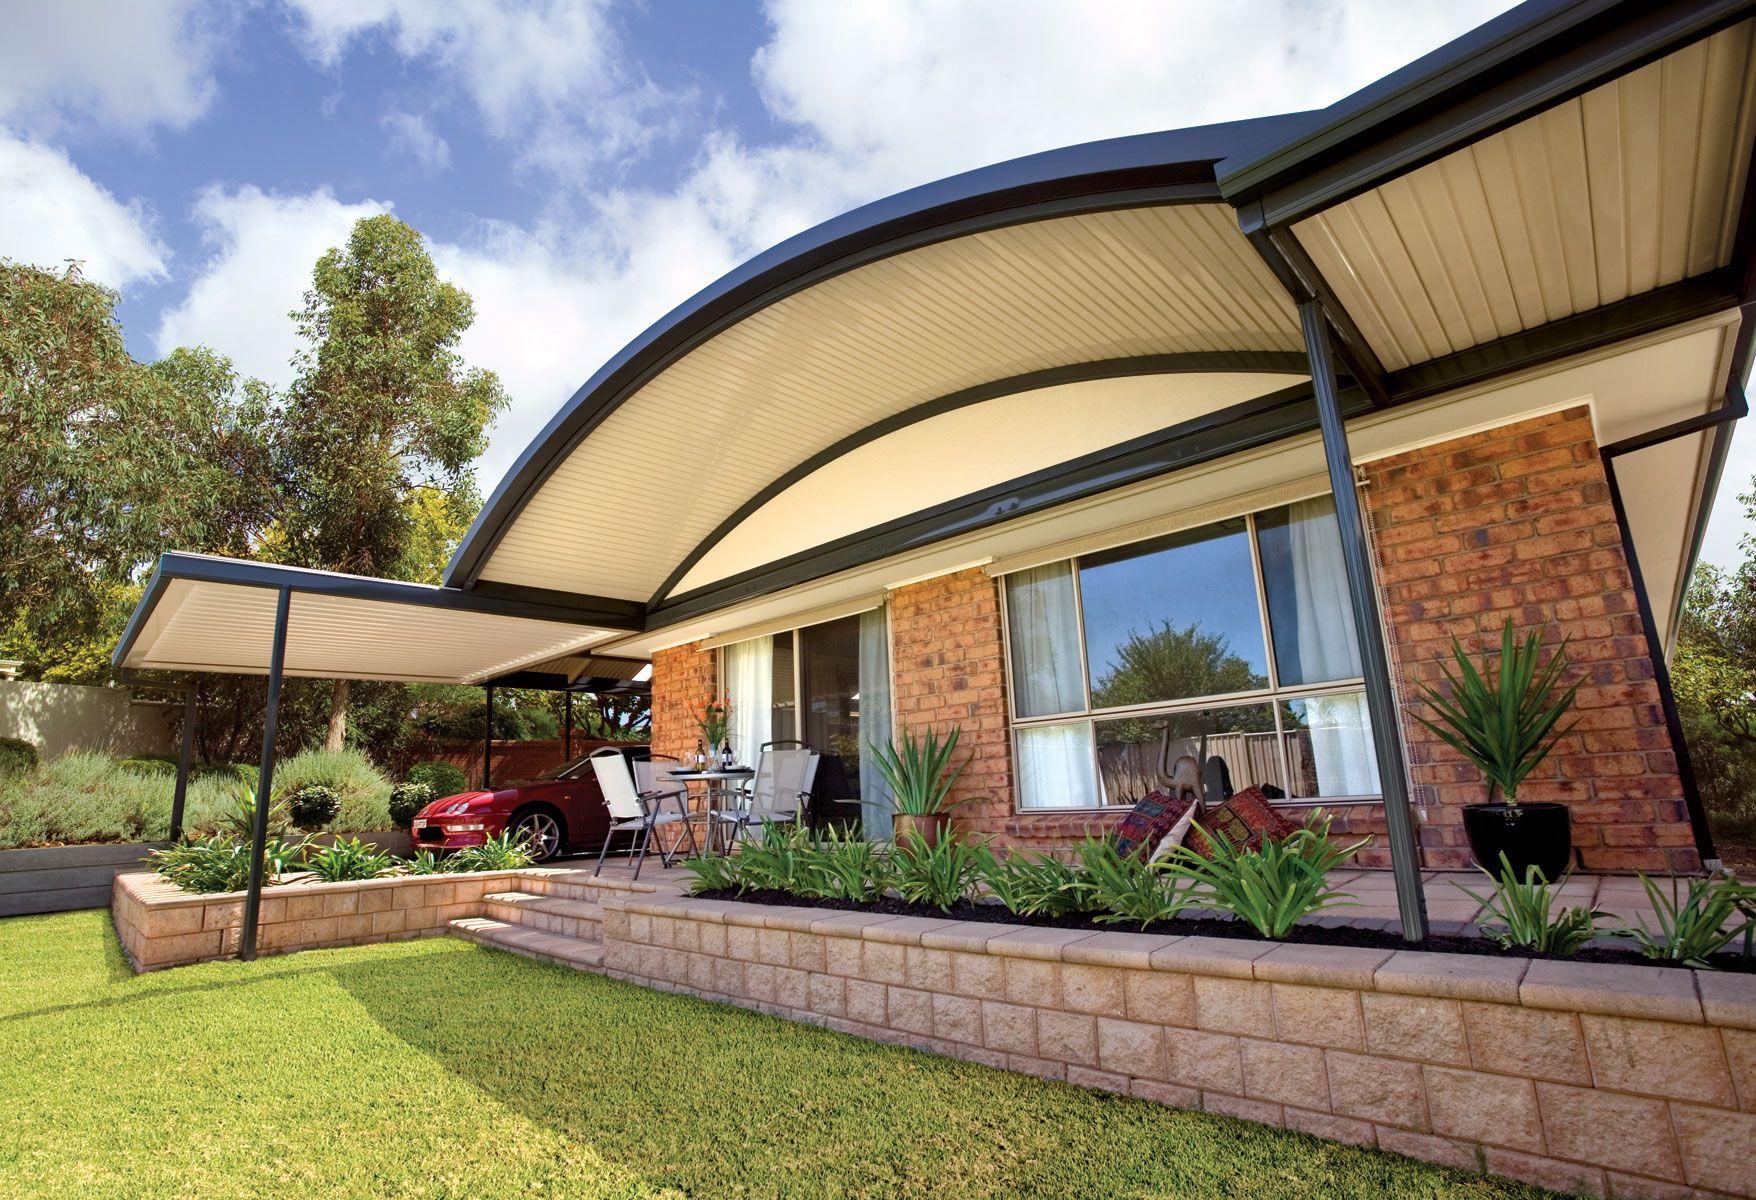 Buy a Carport Deck or Patio for your home Pergola patio